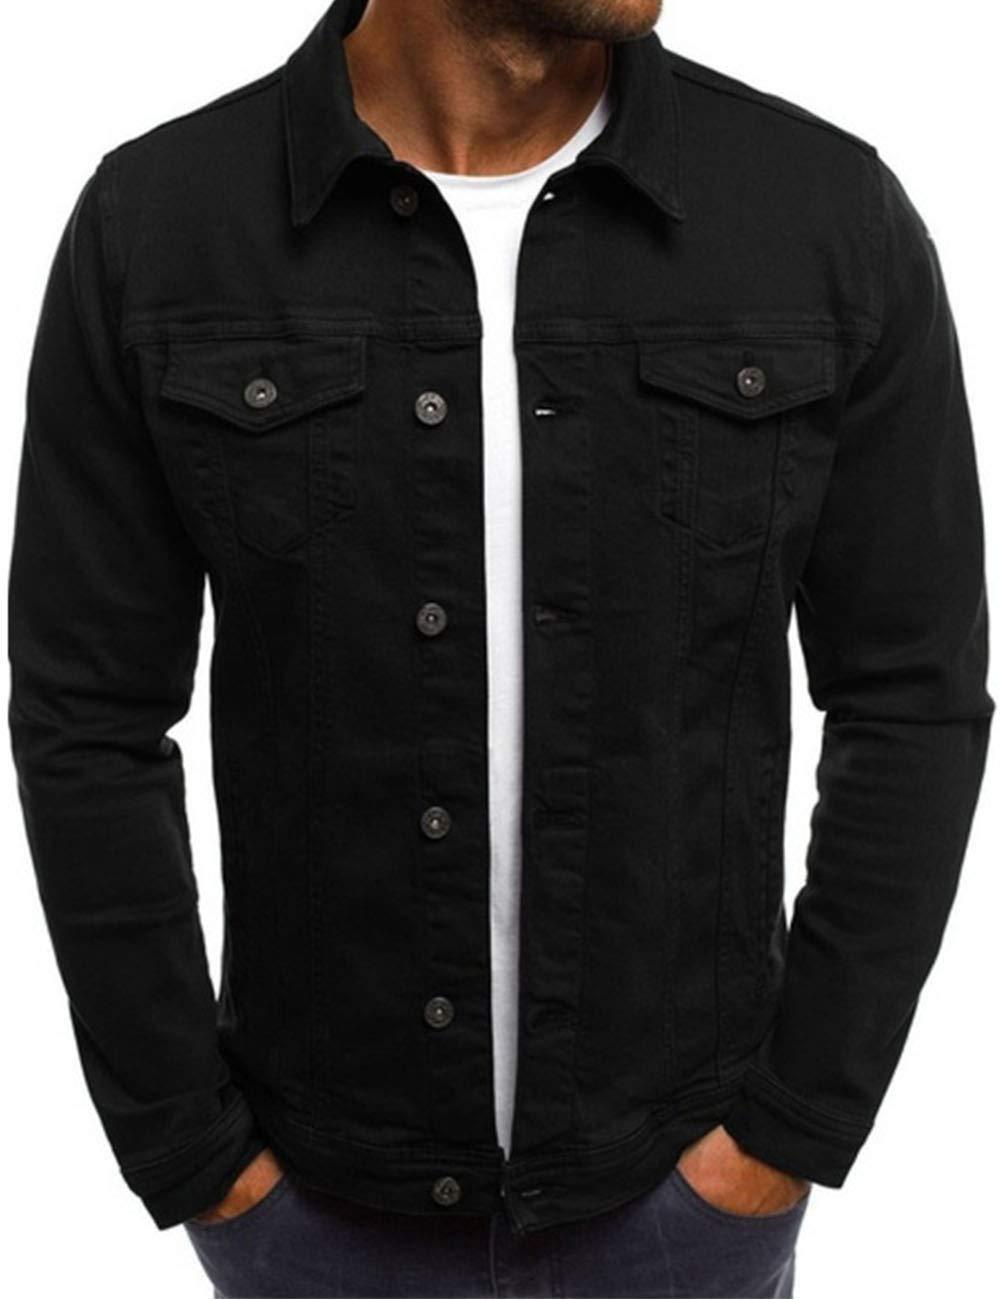 Men's Oversize Cozy Regular Fit Utility Pocket Overshirt Long Sleeve Slim Fit Button Up Denim Field Shirt Jacket(BL-L) by SOMTHRON